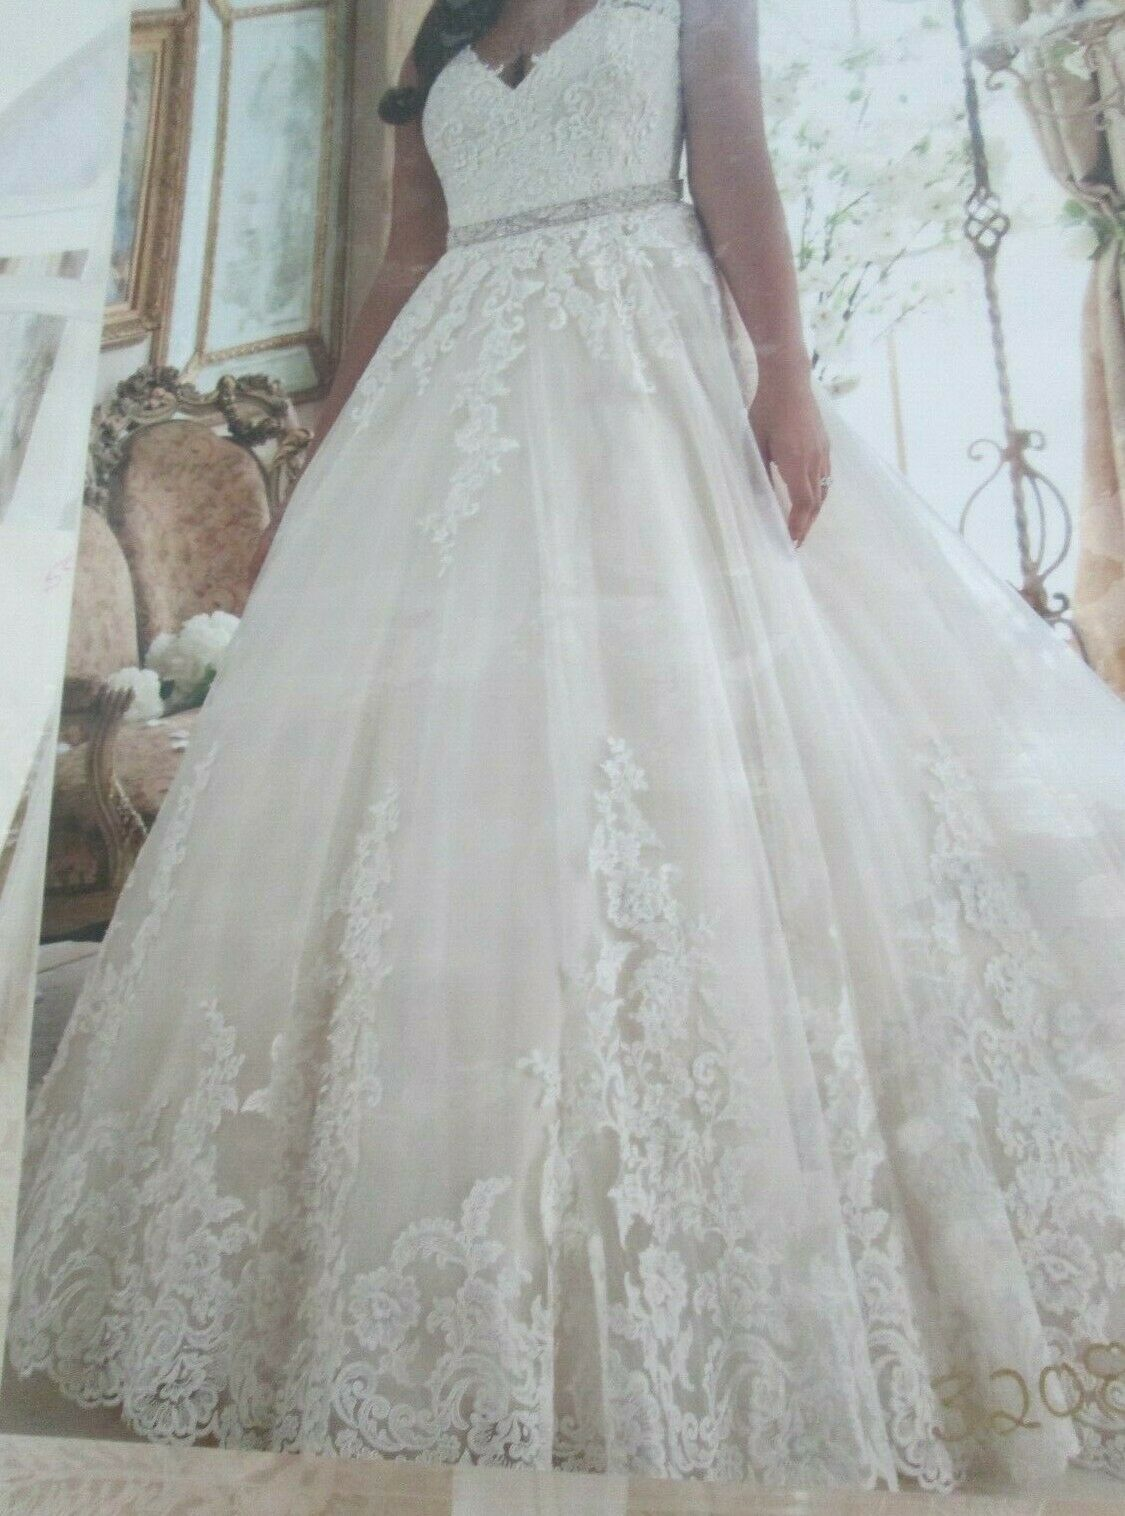 Mori Lee Wedding Dress #3208- Ivory/Lt. Gold - Size 18 - 58